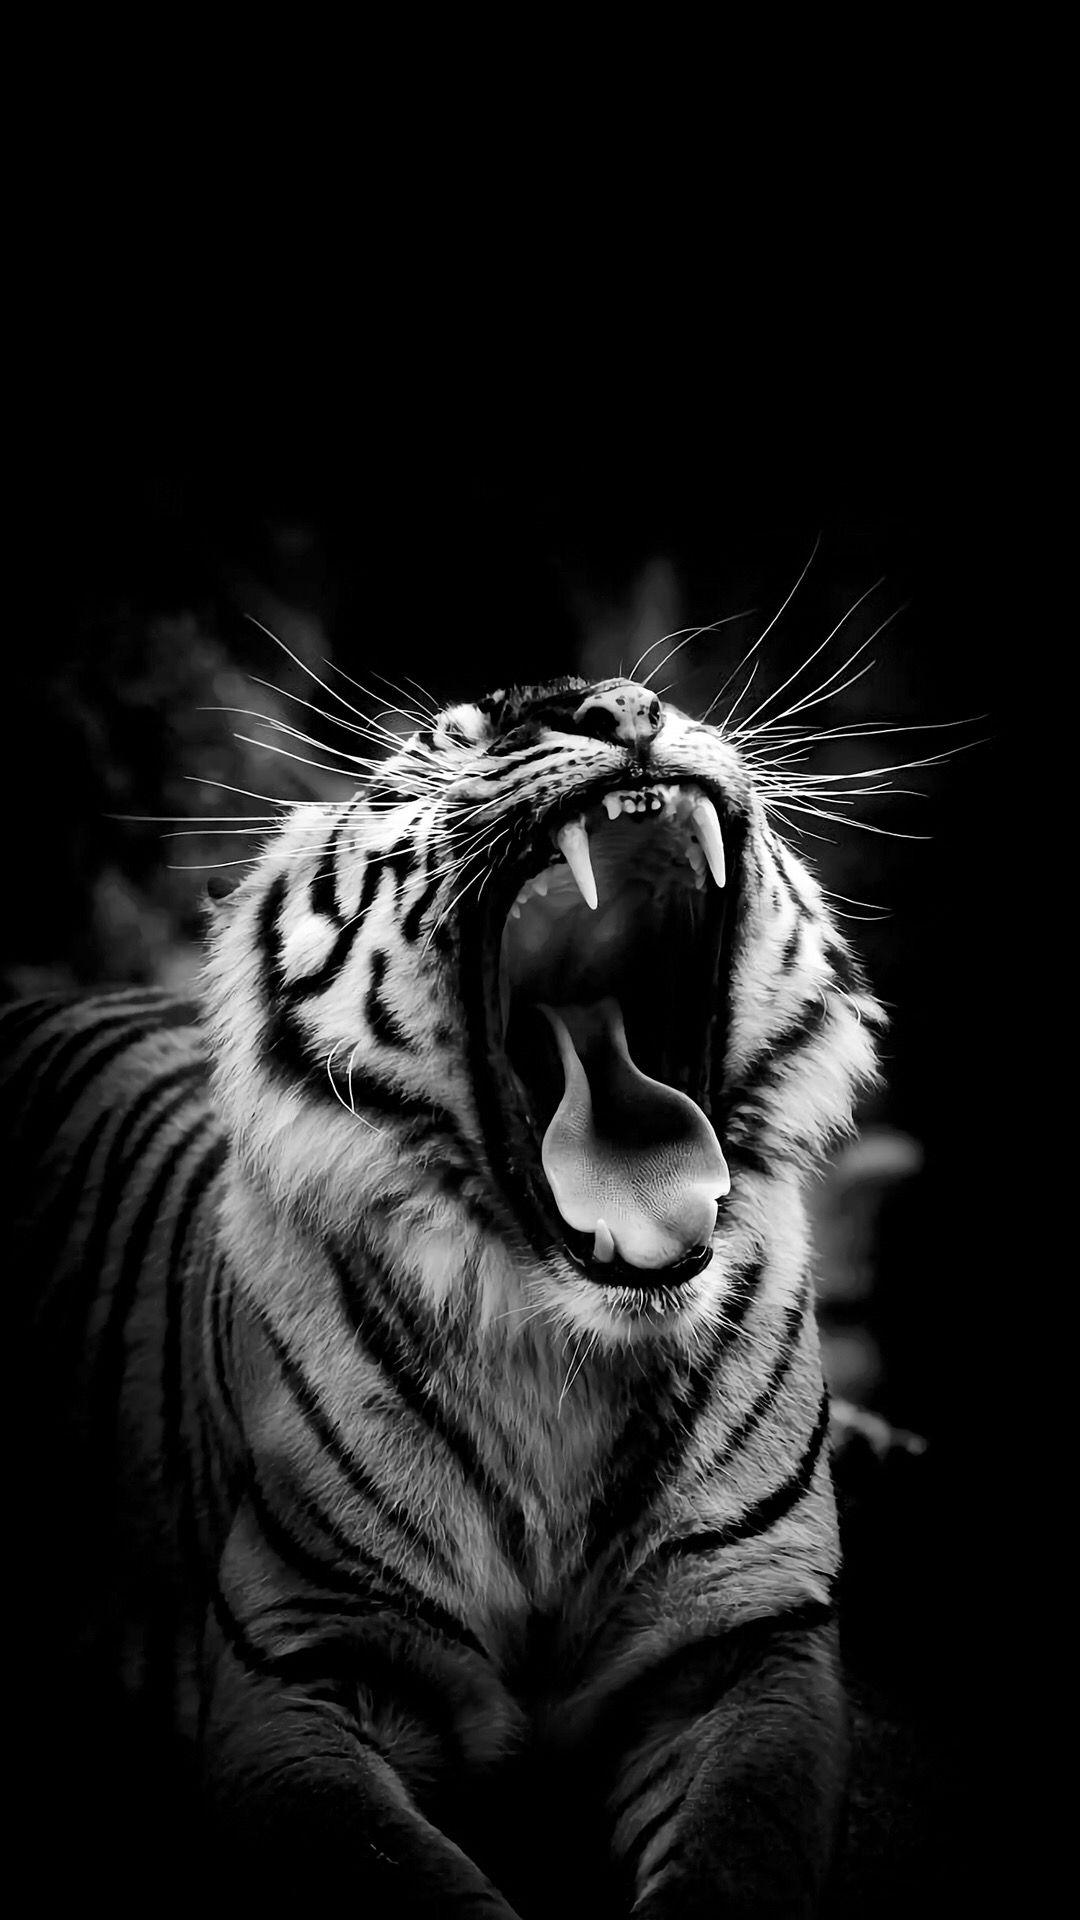 Best Hd Blackberry Z10 Wallpapers Tiger Images Tiger Pictures Tiger Wallpaper